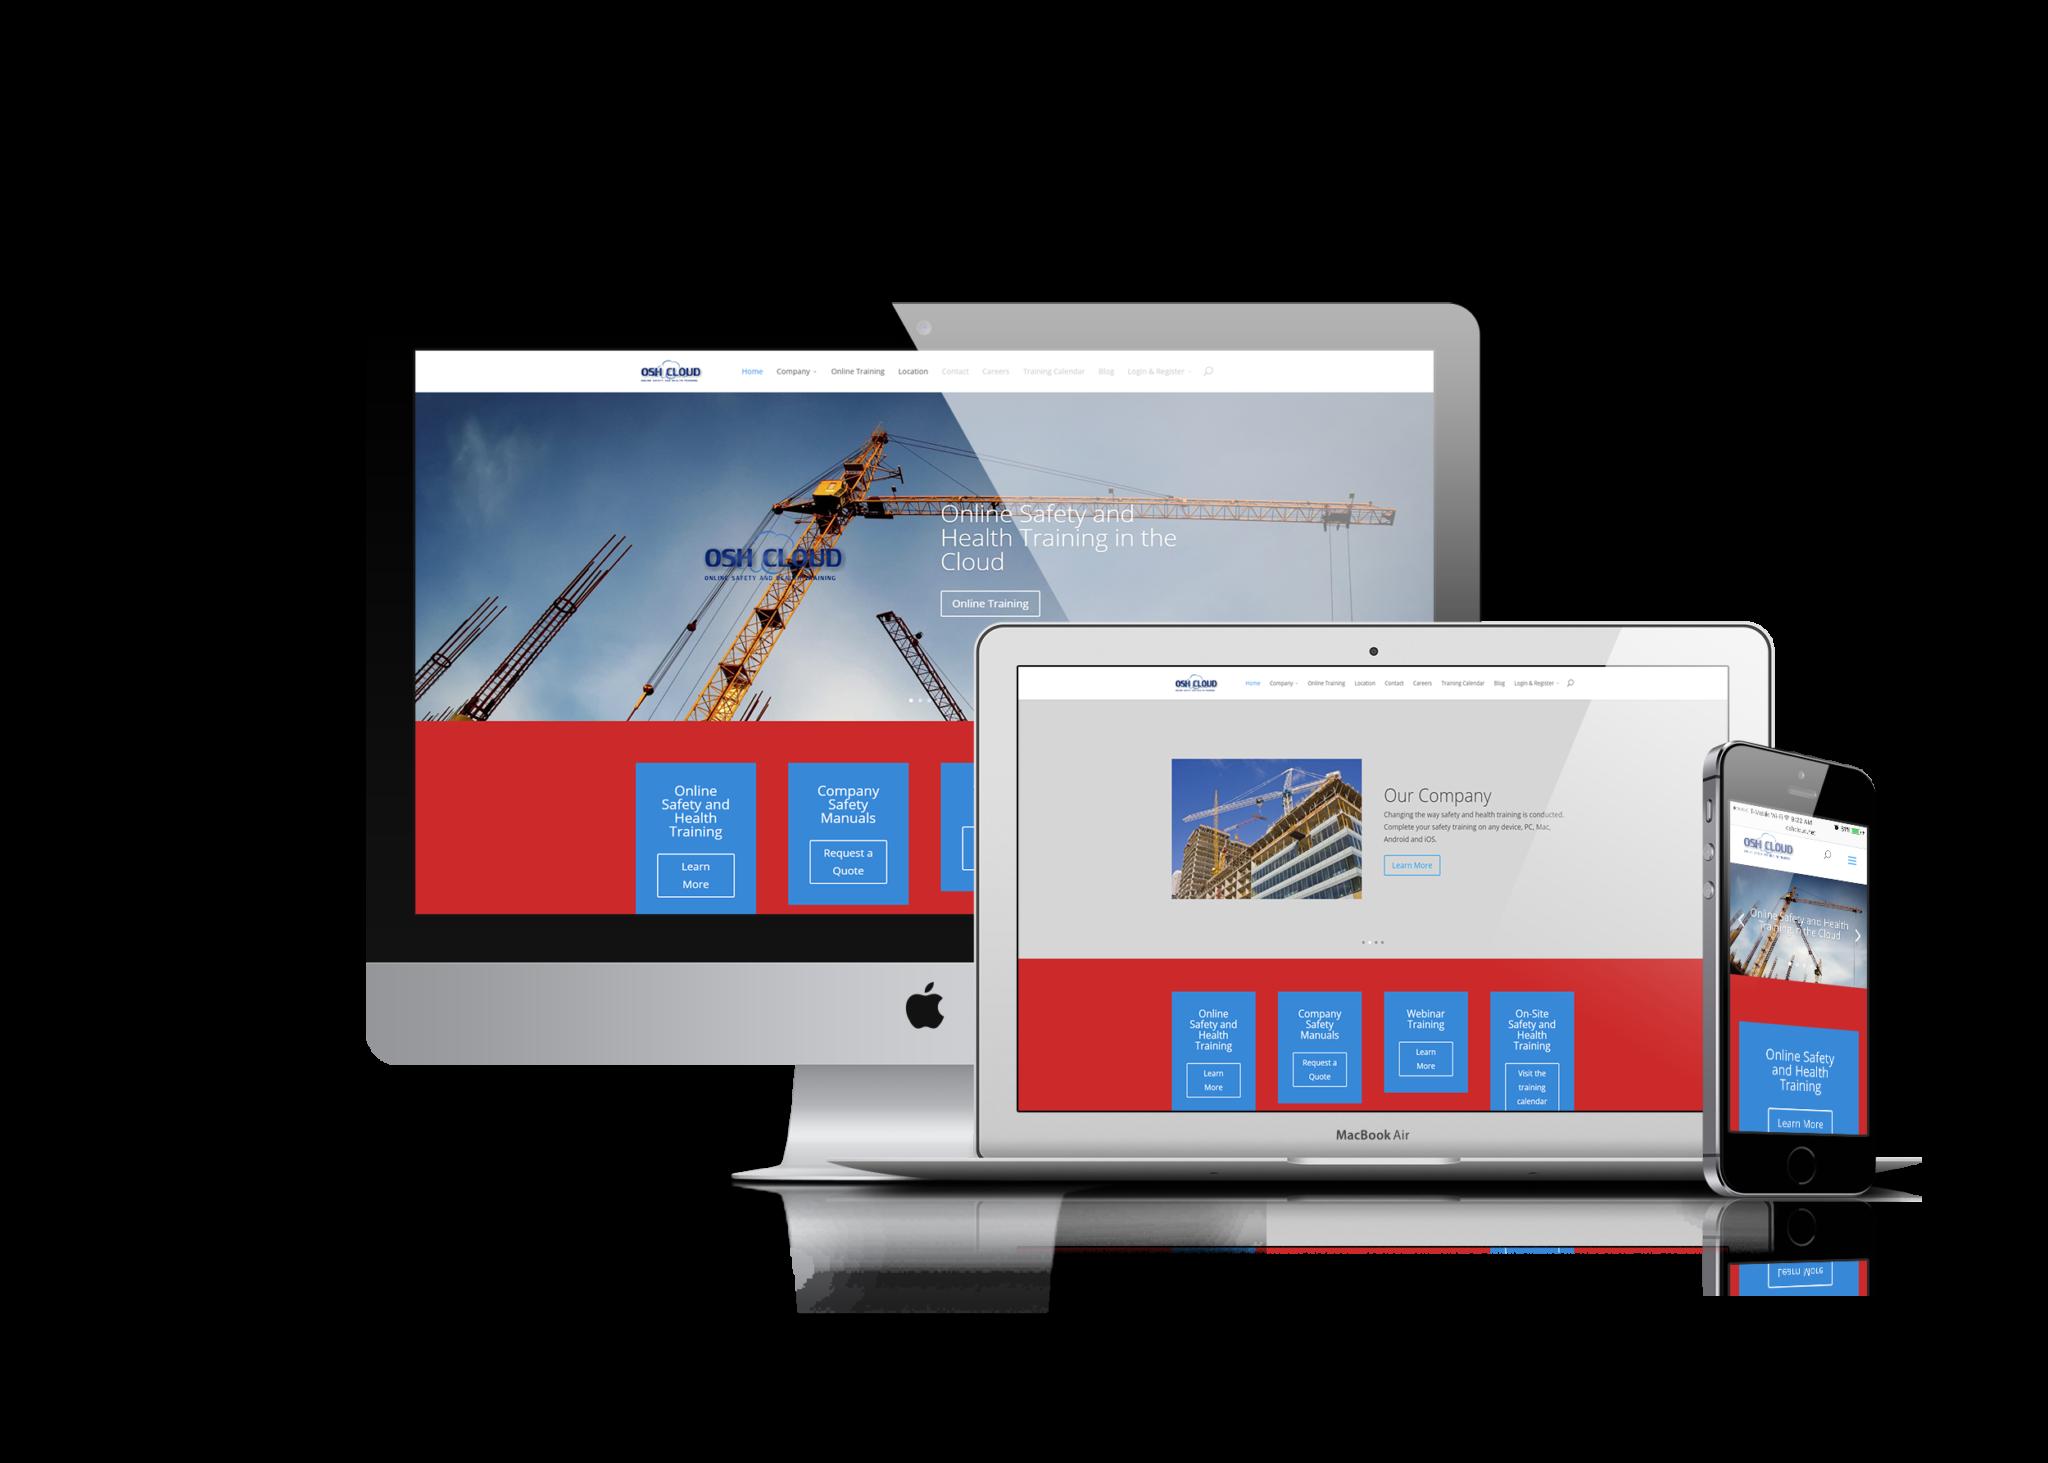 Web Design, Web Programming and Web Development Houston